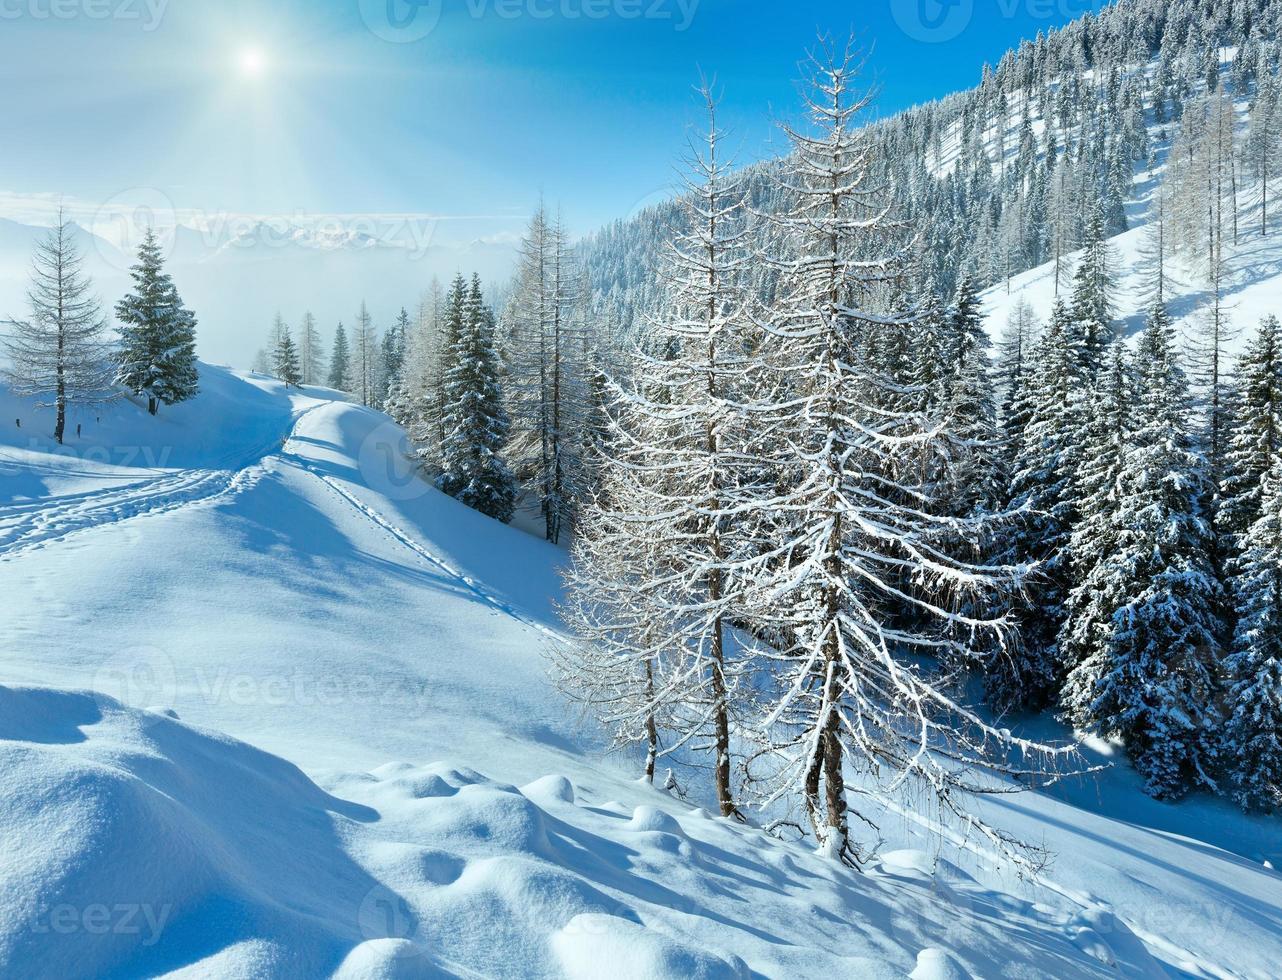 Morning winter misty mountain landscape photo